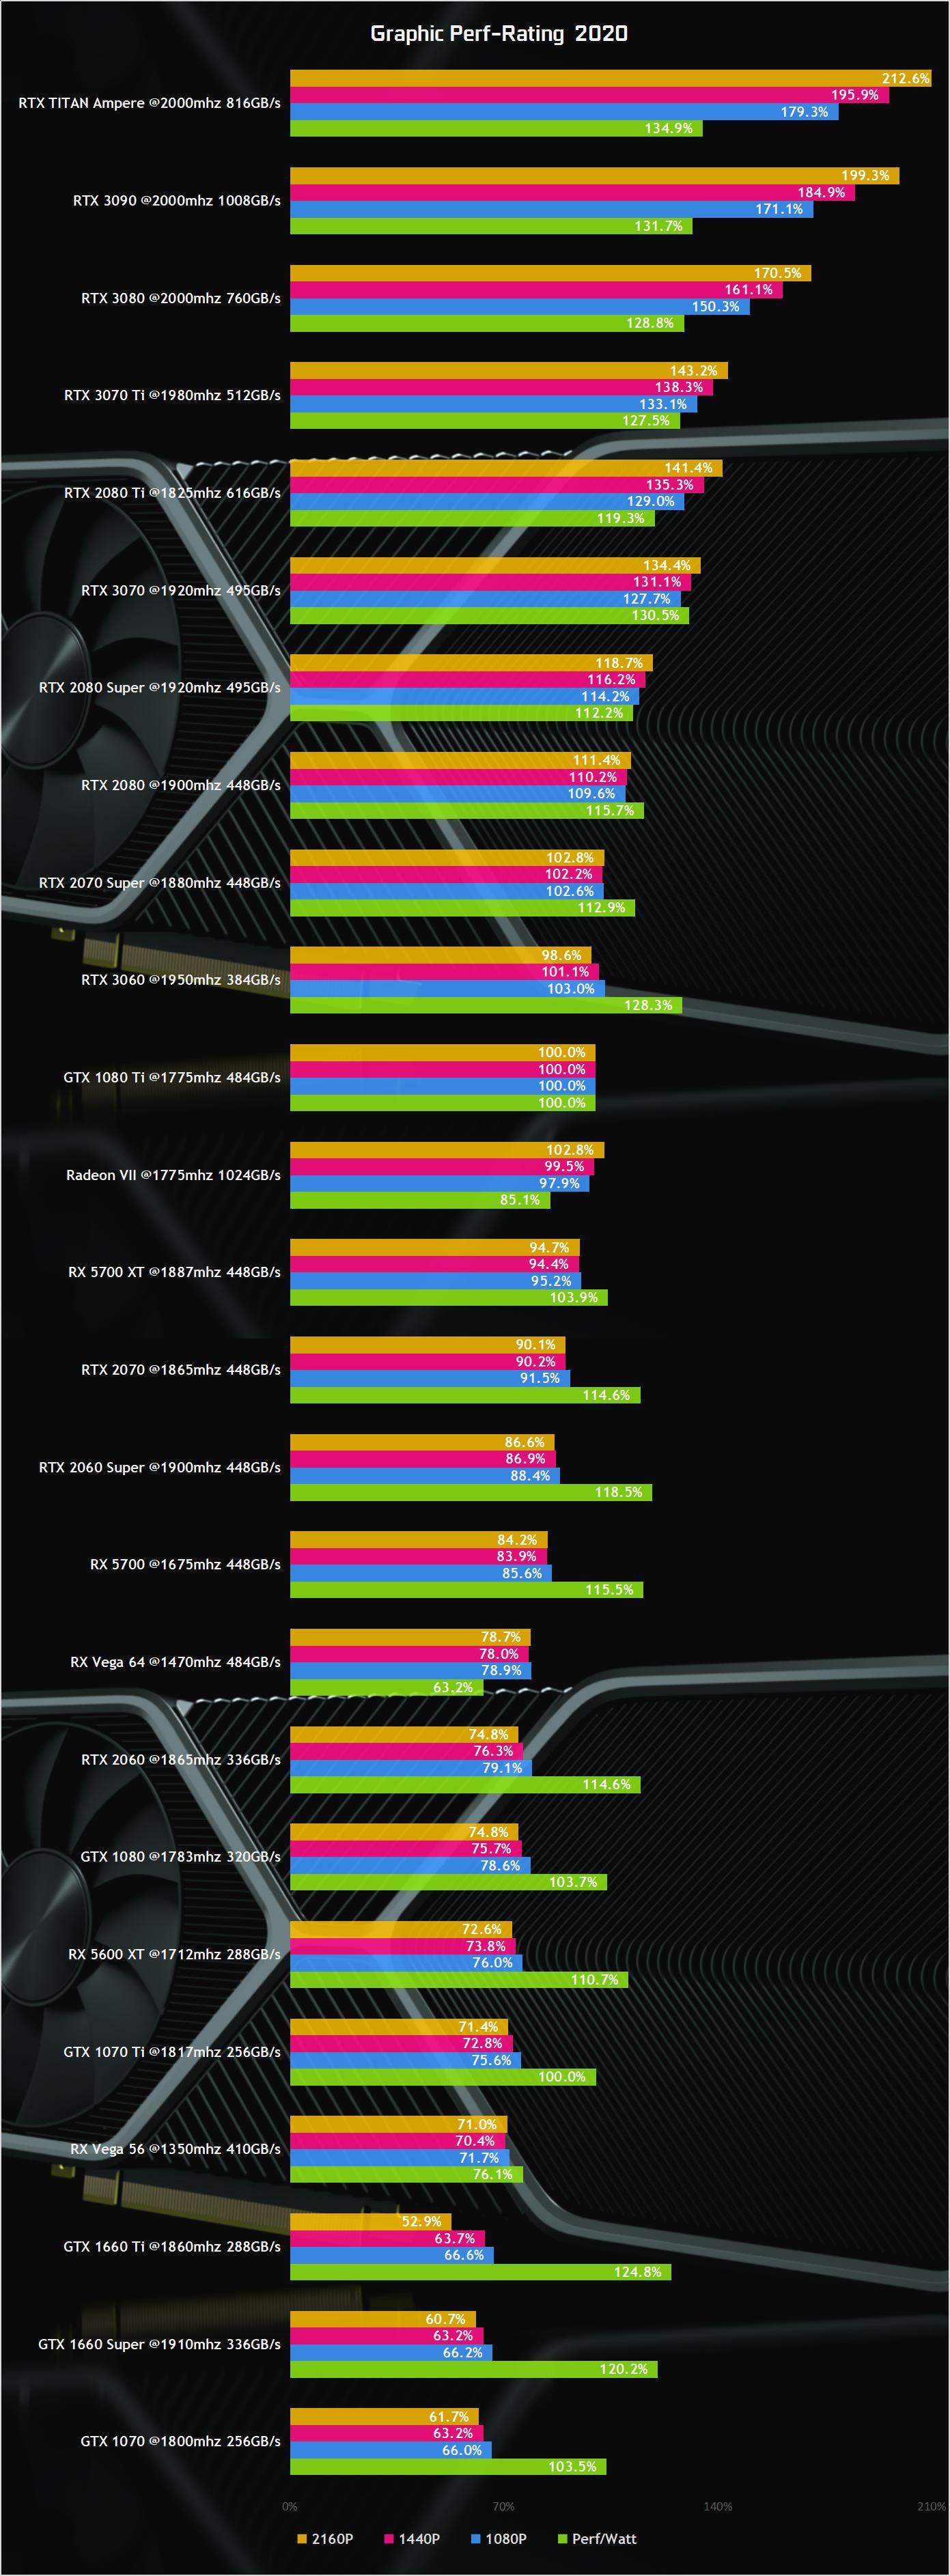 NVIDIA GeForce RTX 3090, GeForce RTX 3080, GeForce RTX 3070 TI, GeForce RTX 3070, GeForce RTX 3060 Gaming Performance Benchmarks